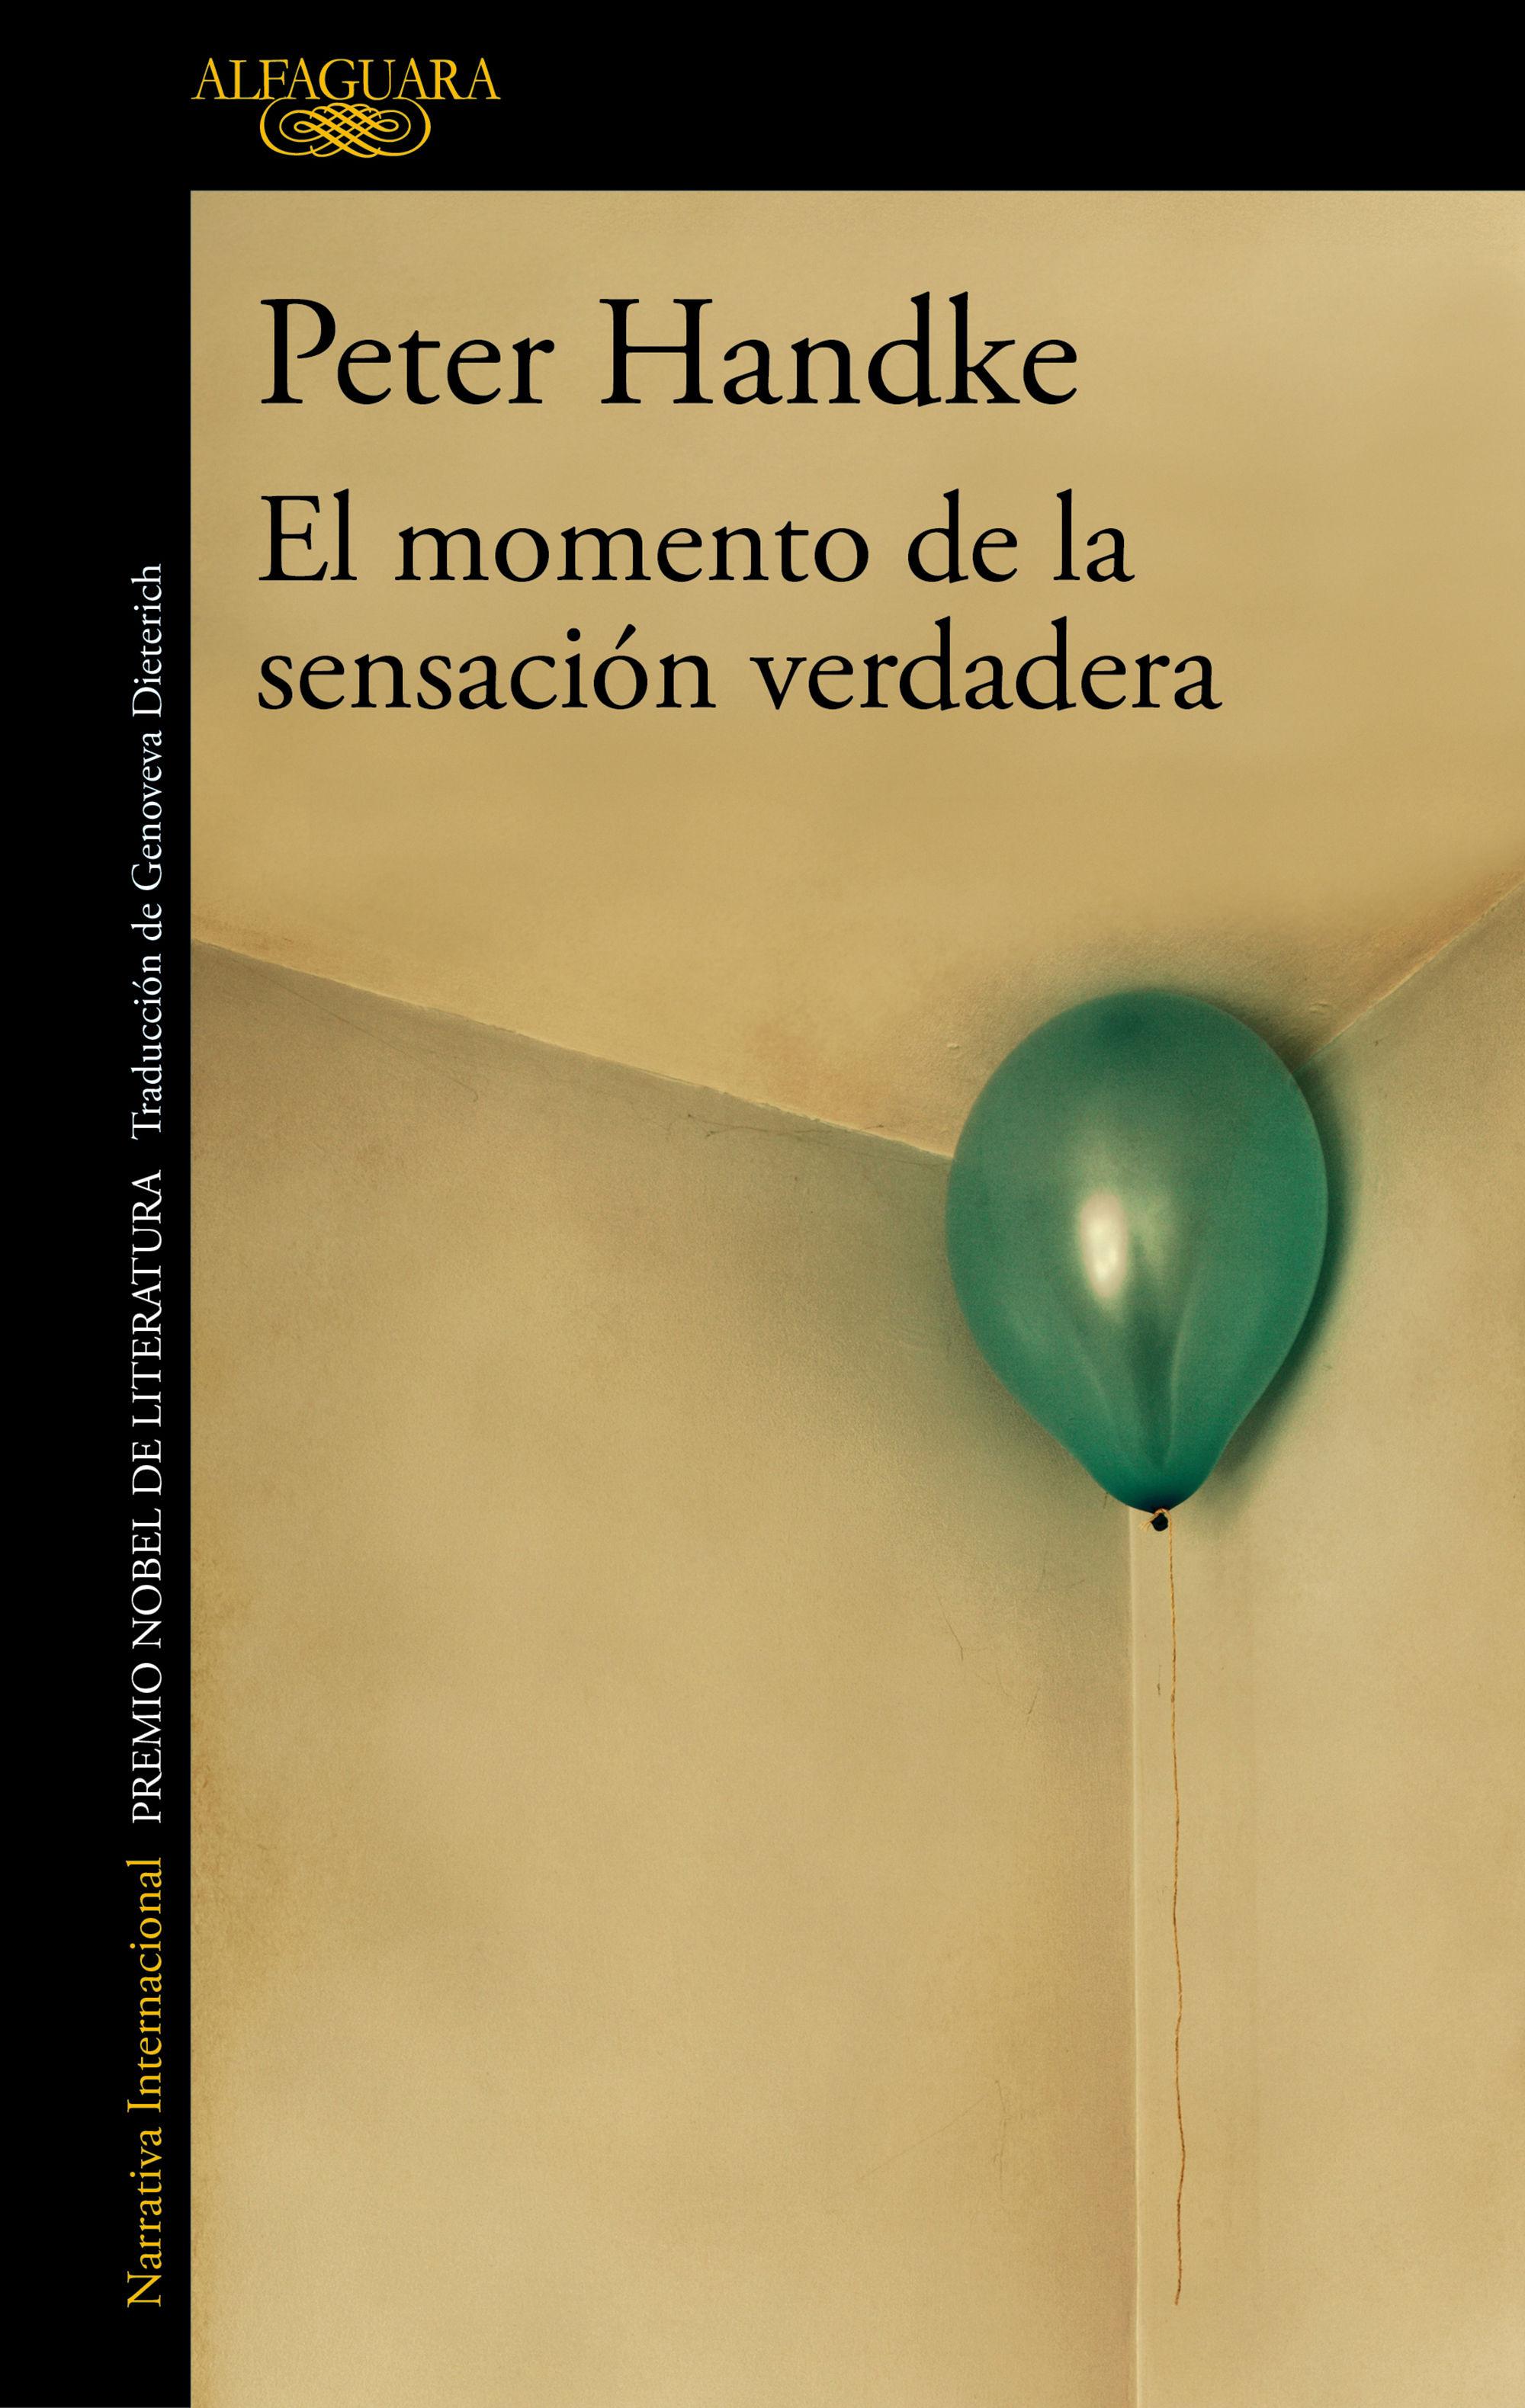 MOMENTO DE LA SENSACION VERDADERA EL